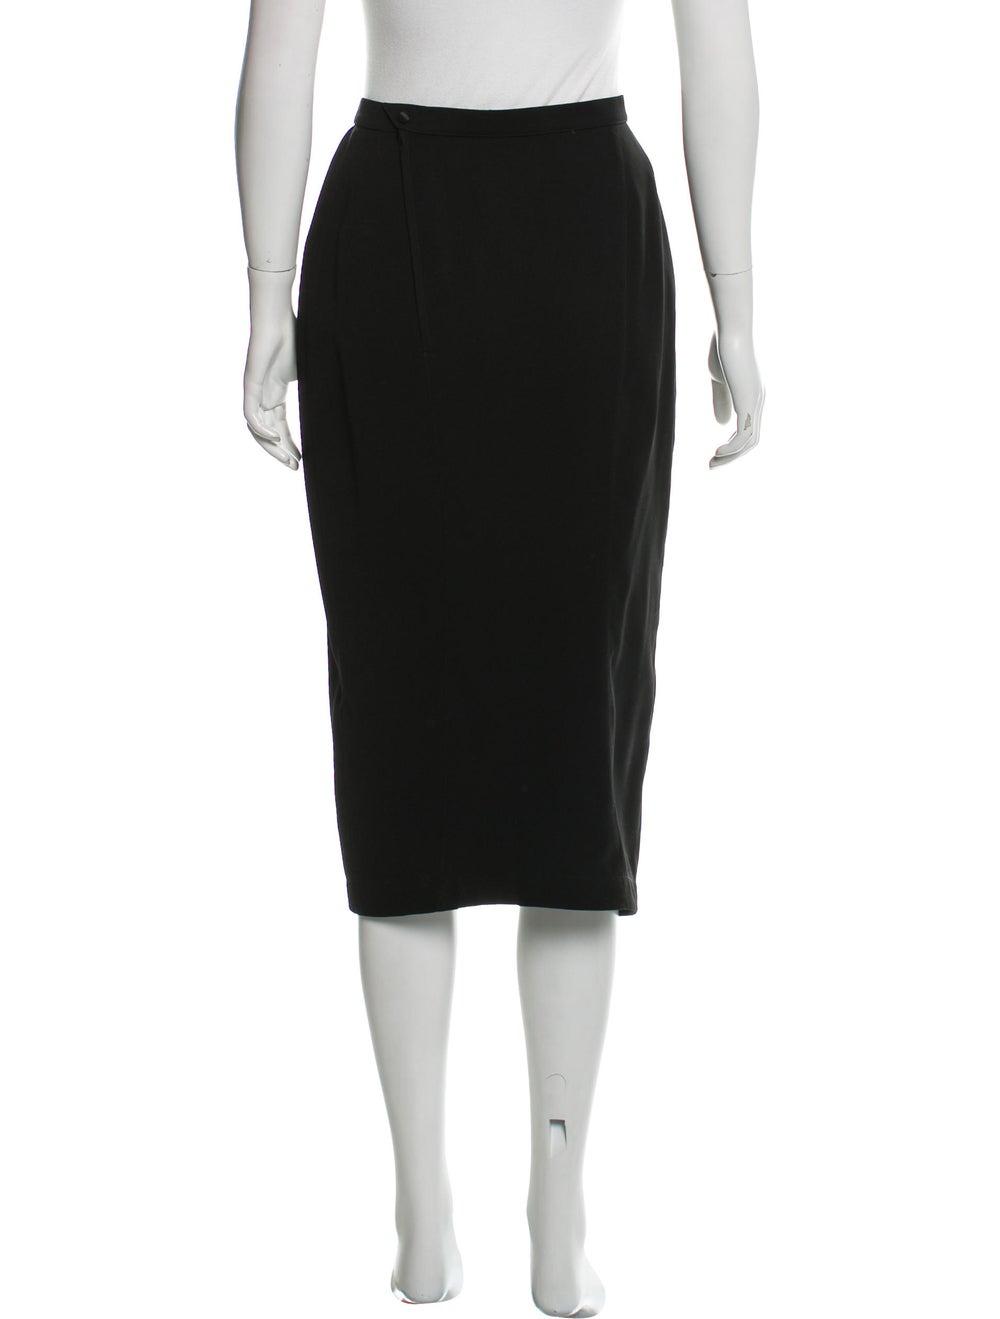 Thierry Mugler Midi Pencil Skirt Black - image 3